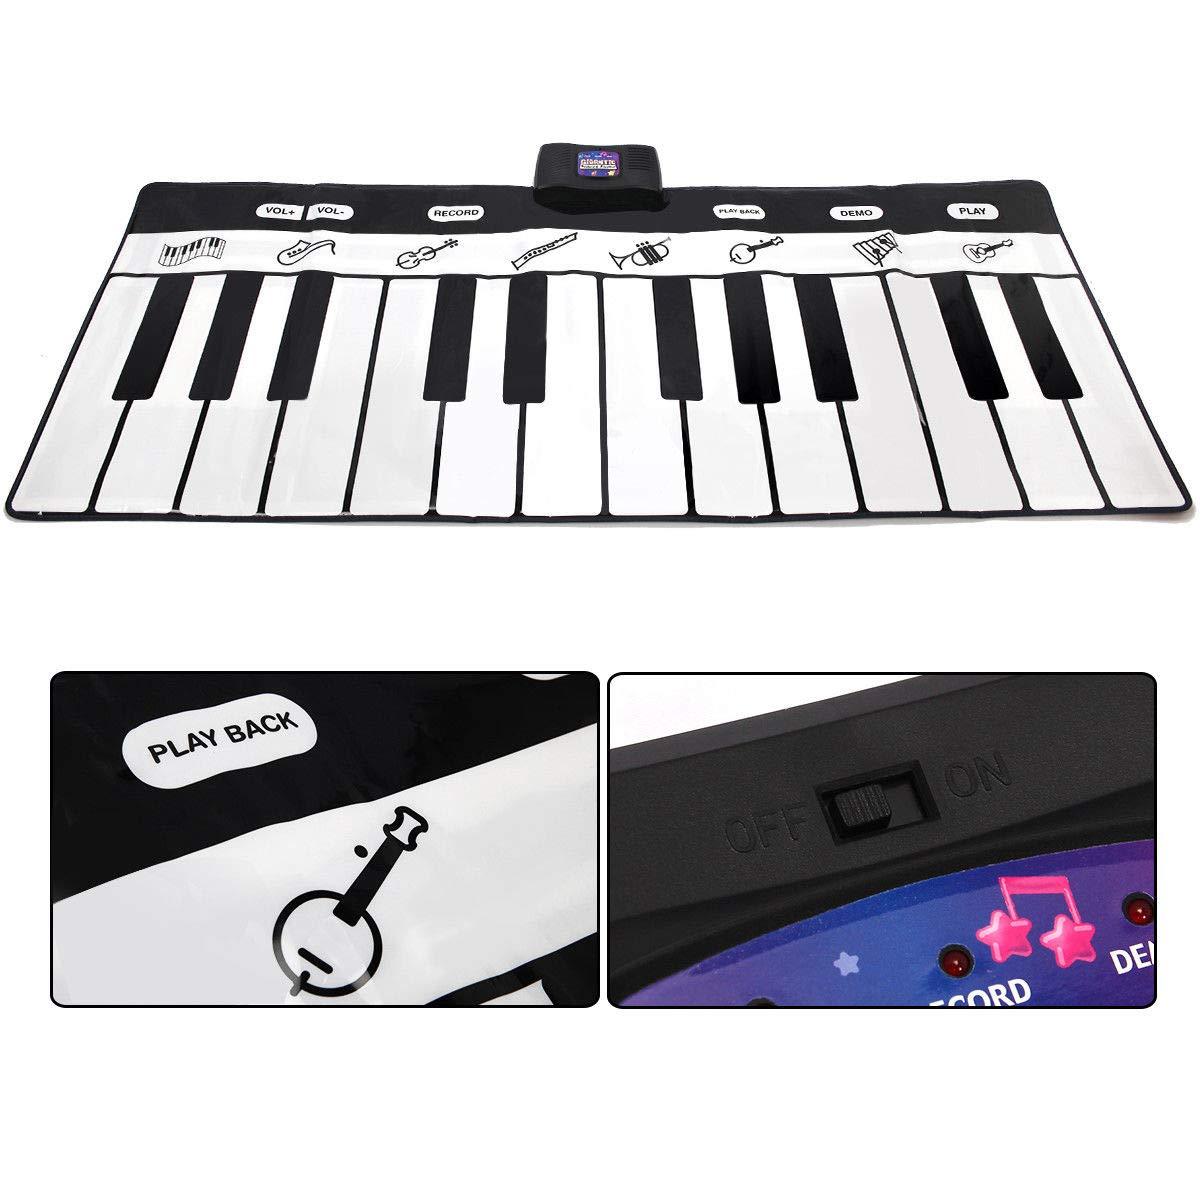 FDInspiration 71'' Kids 24-Key Keyboard Dance Gigantic Piano Playmat w/ 4 Modes with Ebook by FDInspiration (Image #6)